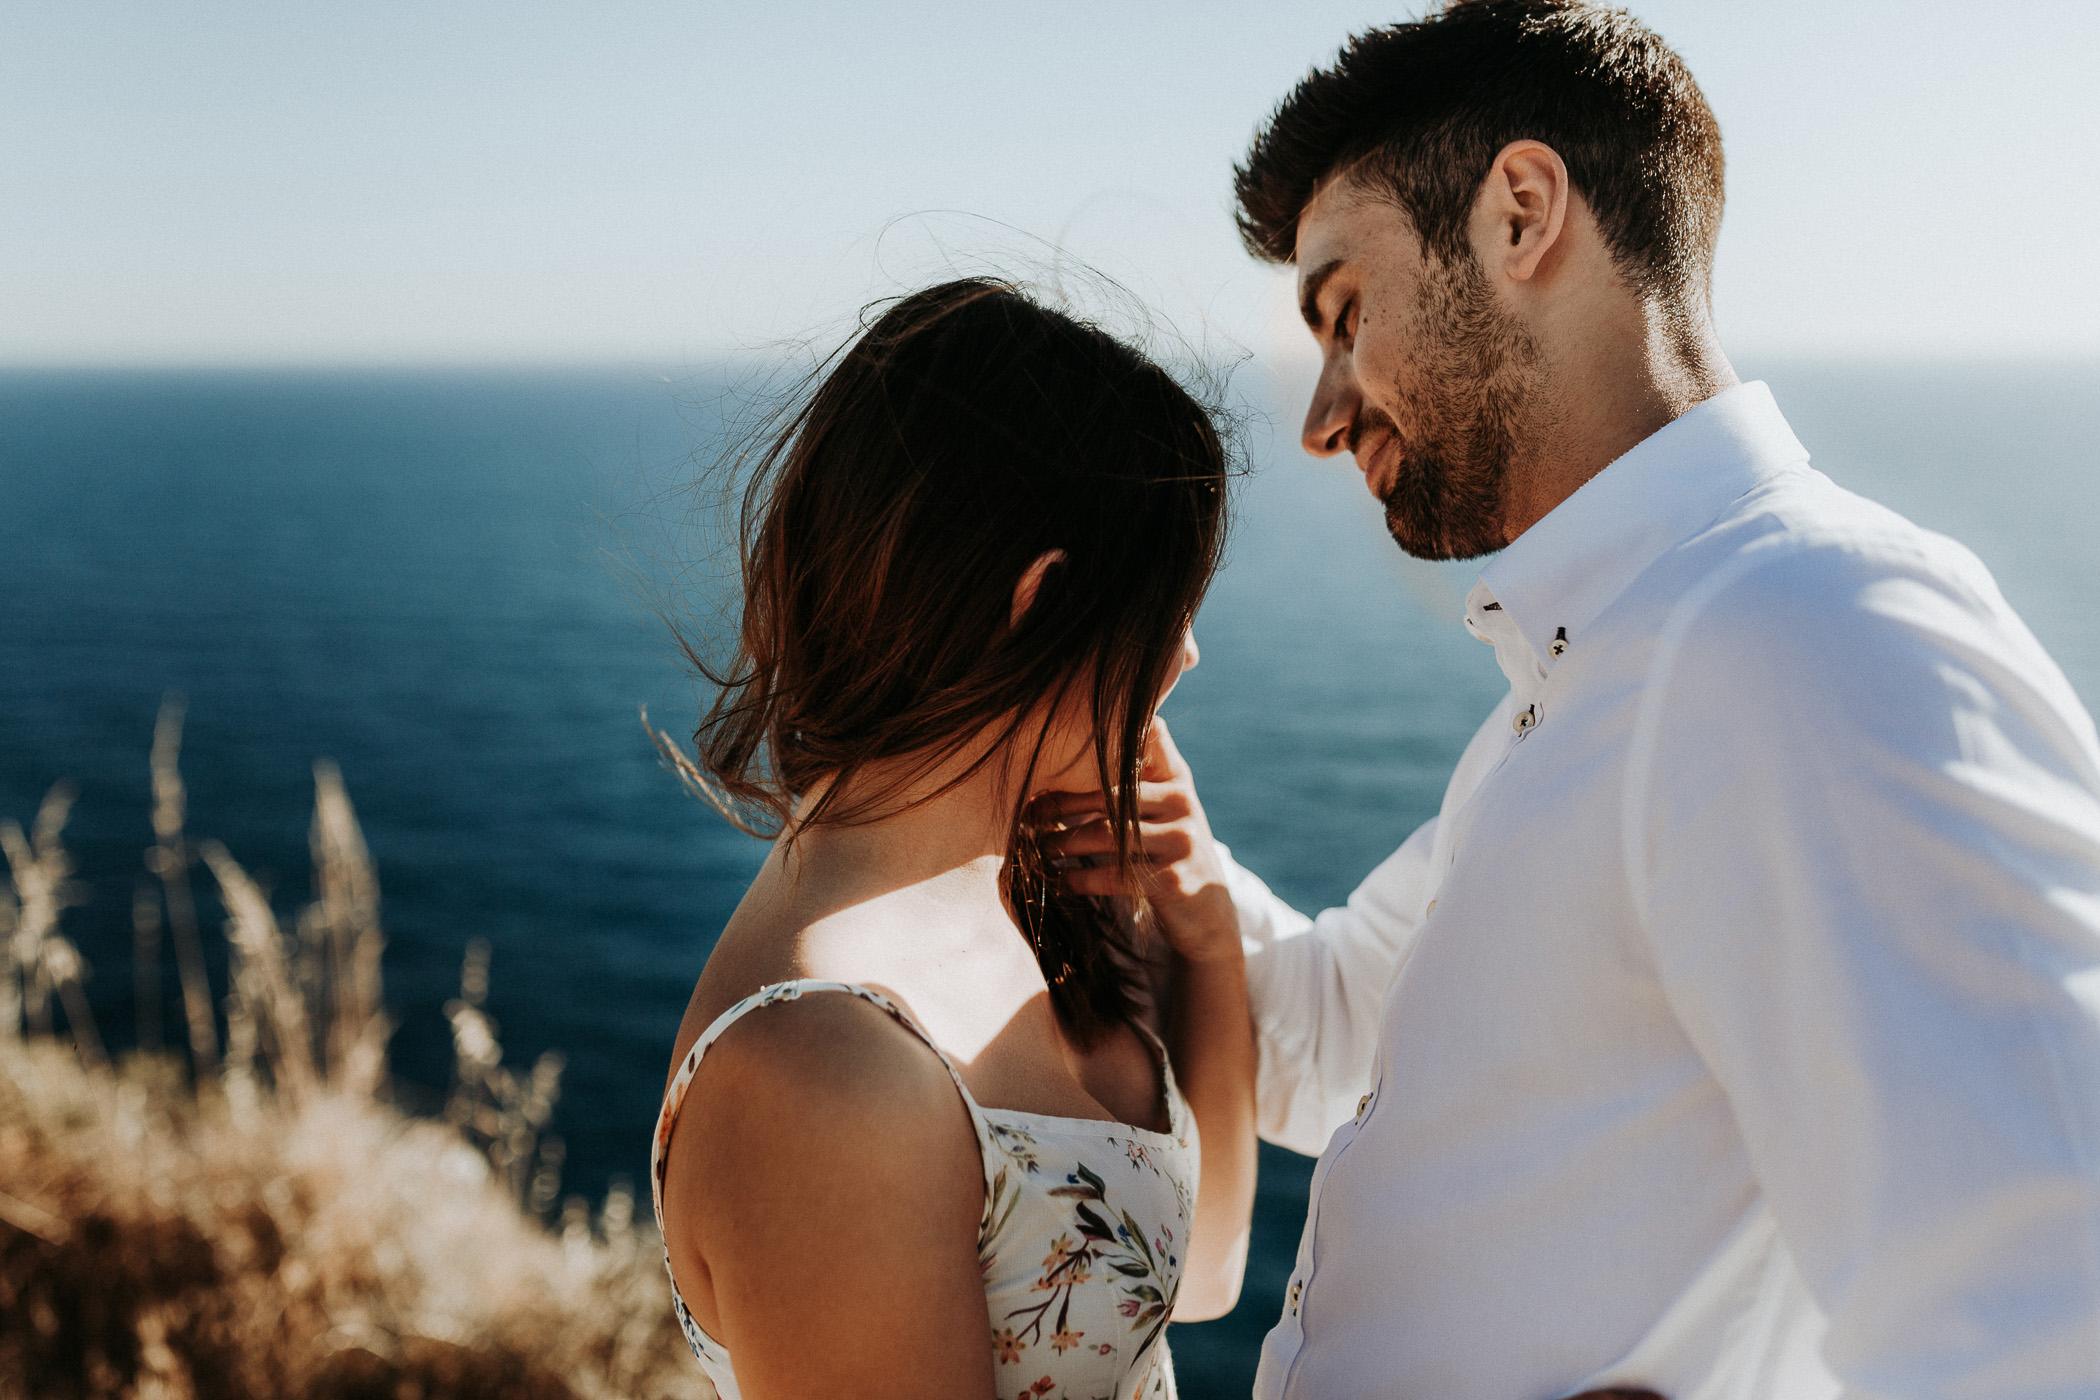 DanielaMarquardtPhotography_wedding_elopement_mallorca_spain_calapi_palma_lauraandtoni_85